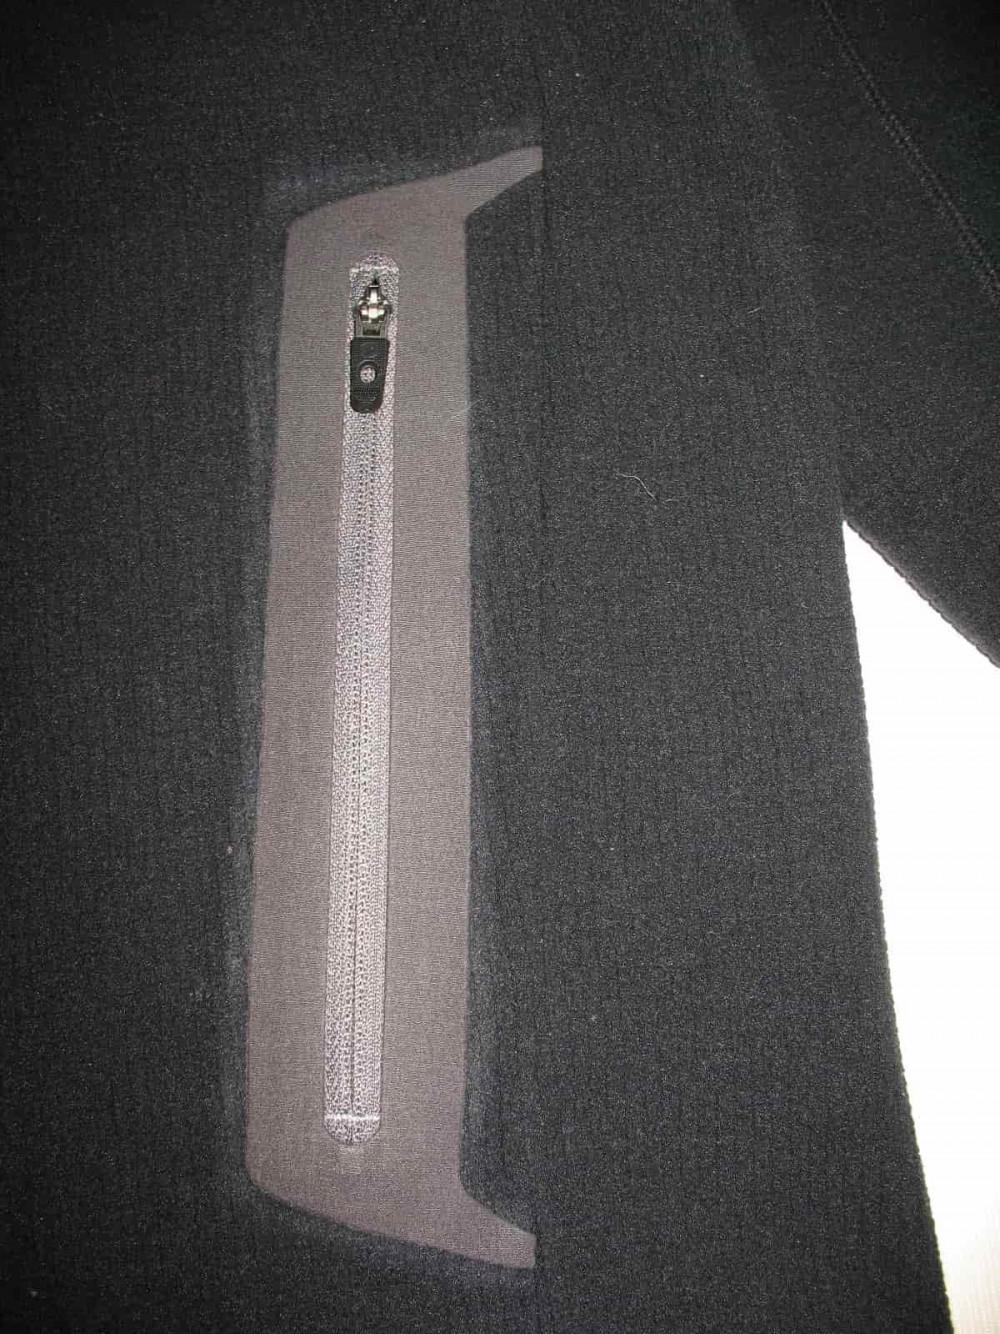 Куртка MARMOT alpinist tech fleece jacket (размер M) - 6